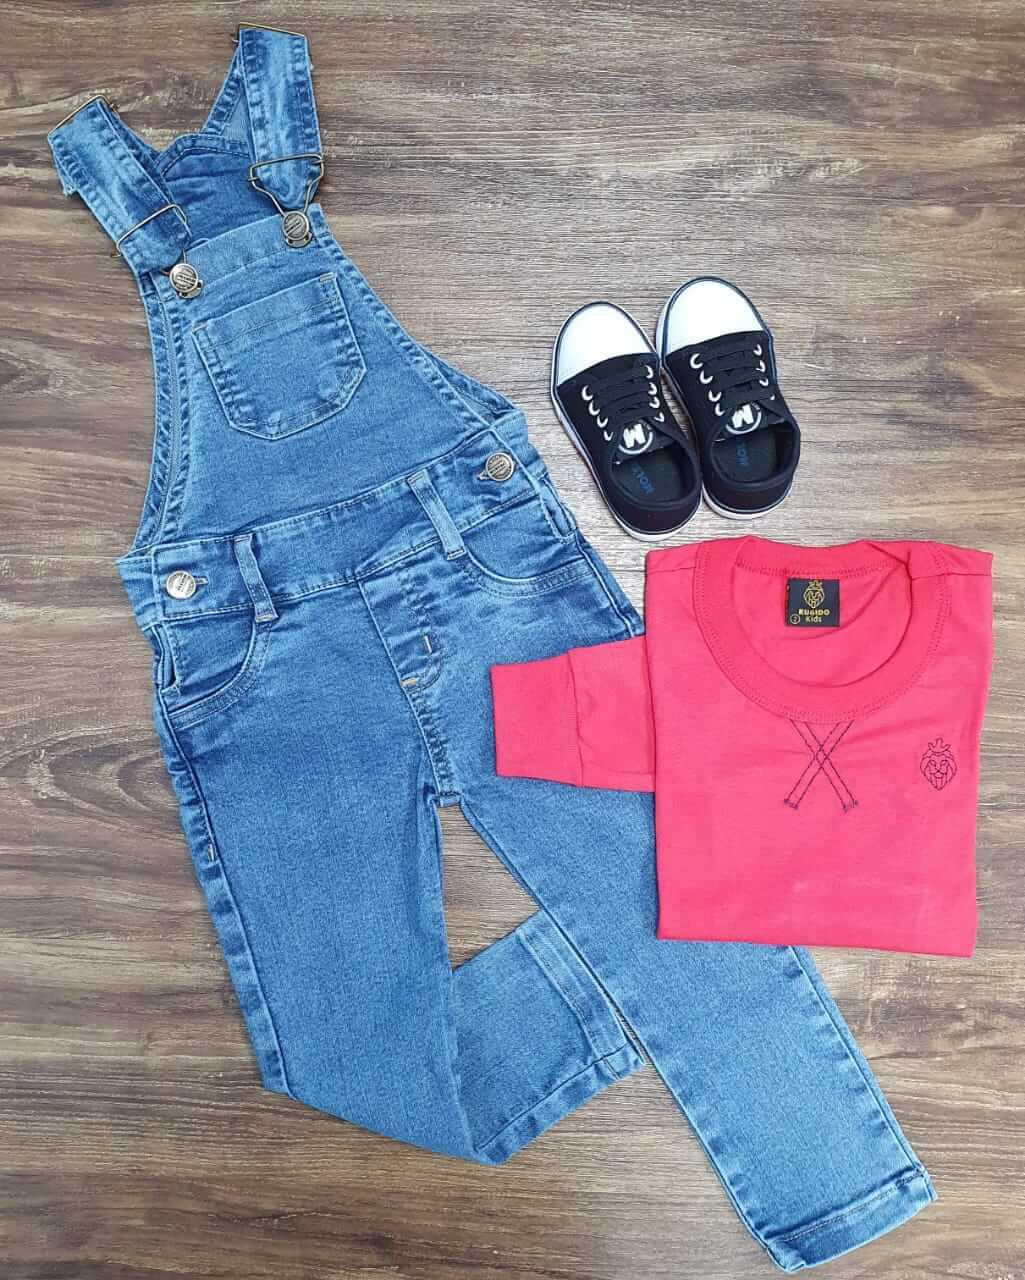 Jardineira Jeans Com Camiseta Manga Longa Infantil